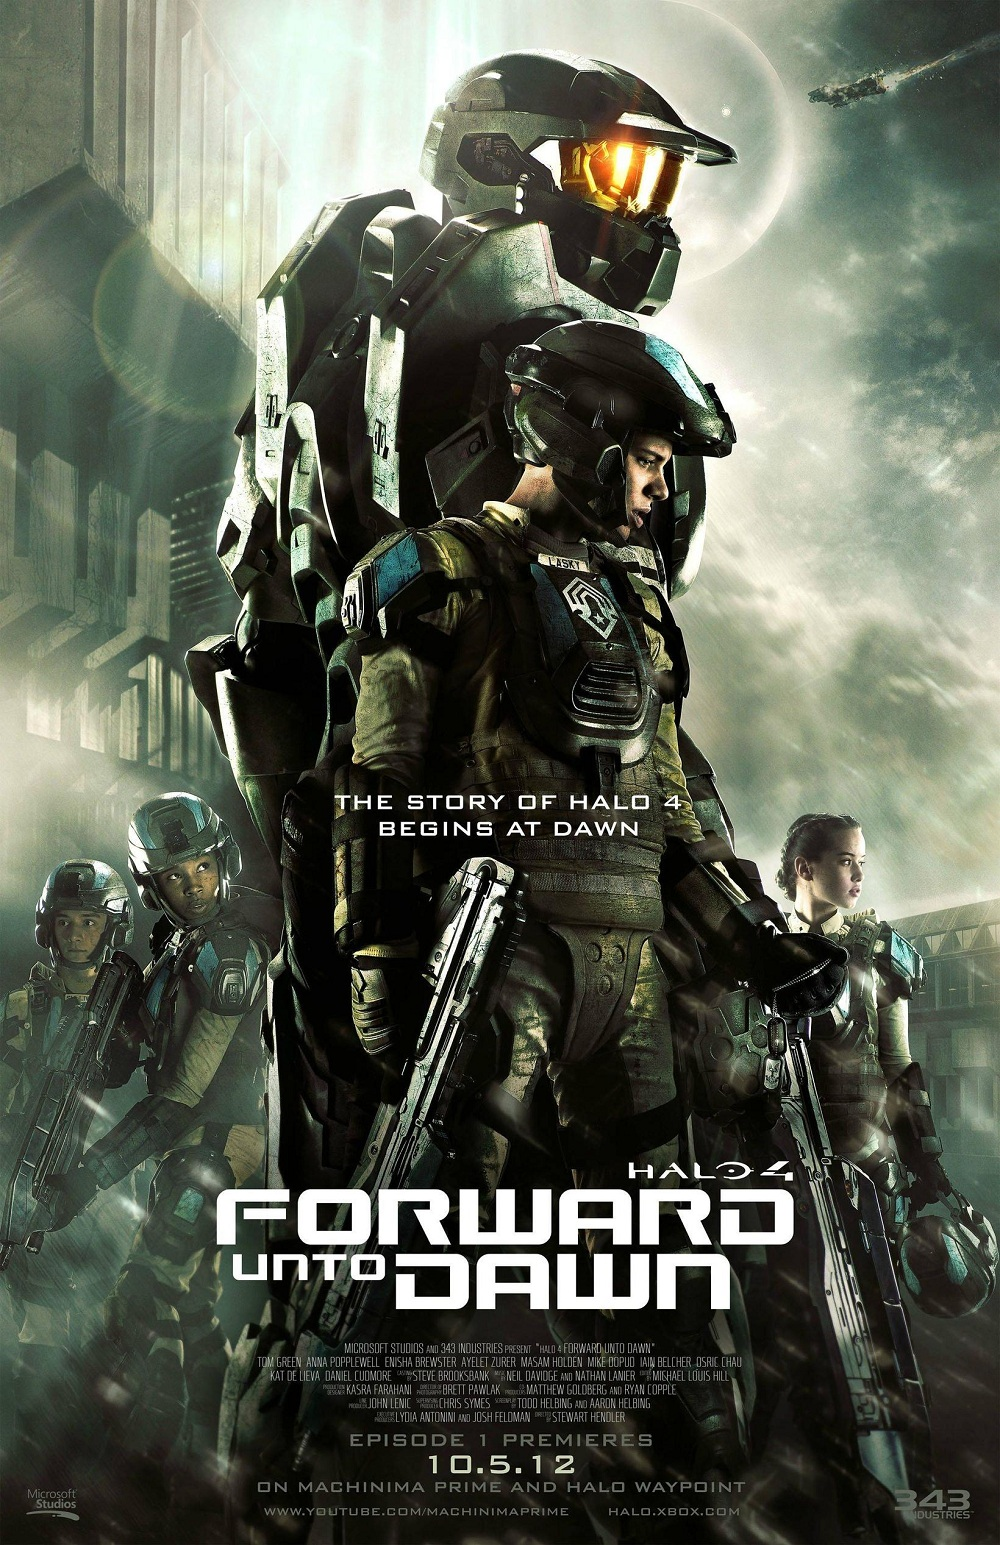 http://2.bp.blogspot.com/-Hfw1_AP_-3s/UABTshqNNoI/AAAAAAAAAxE/96Kipj_2aUI/s1600/Halo-4-Forward-Unto-Dawn-01.jpg